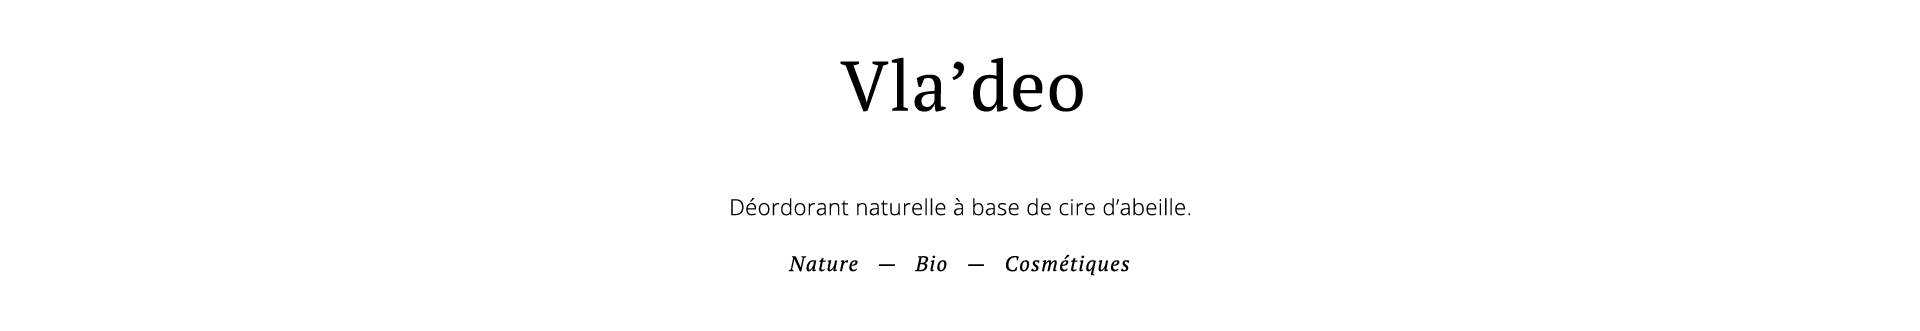 TexteVivan-texte-copie